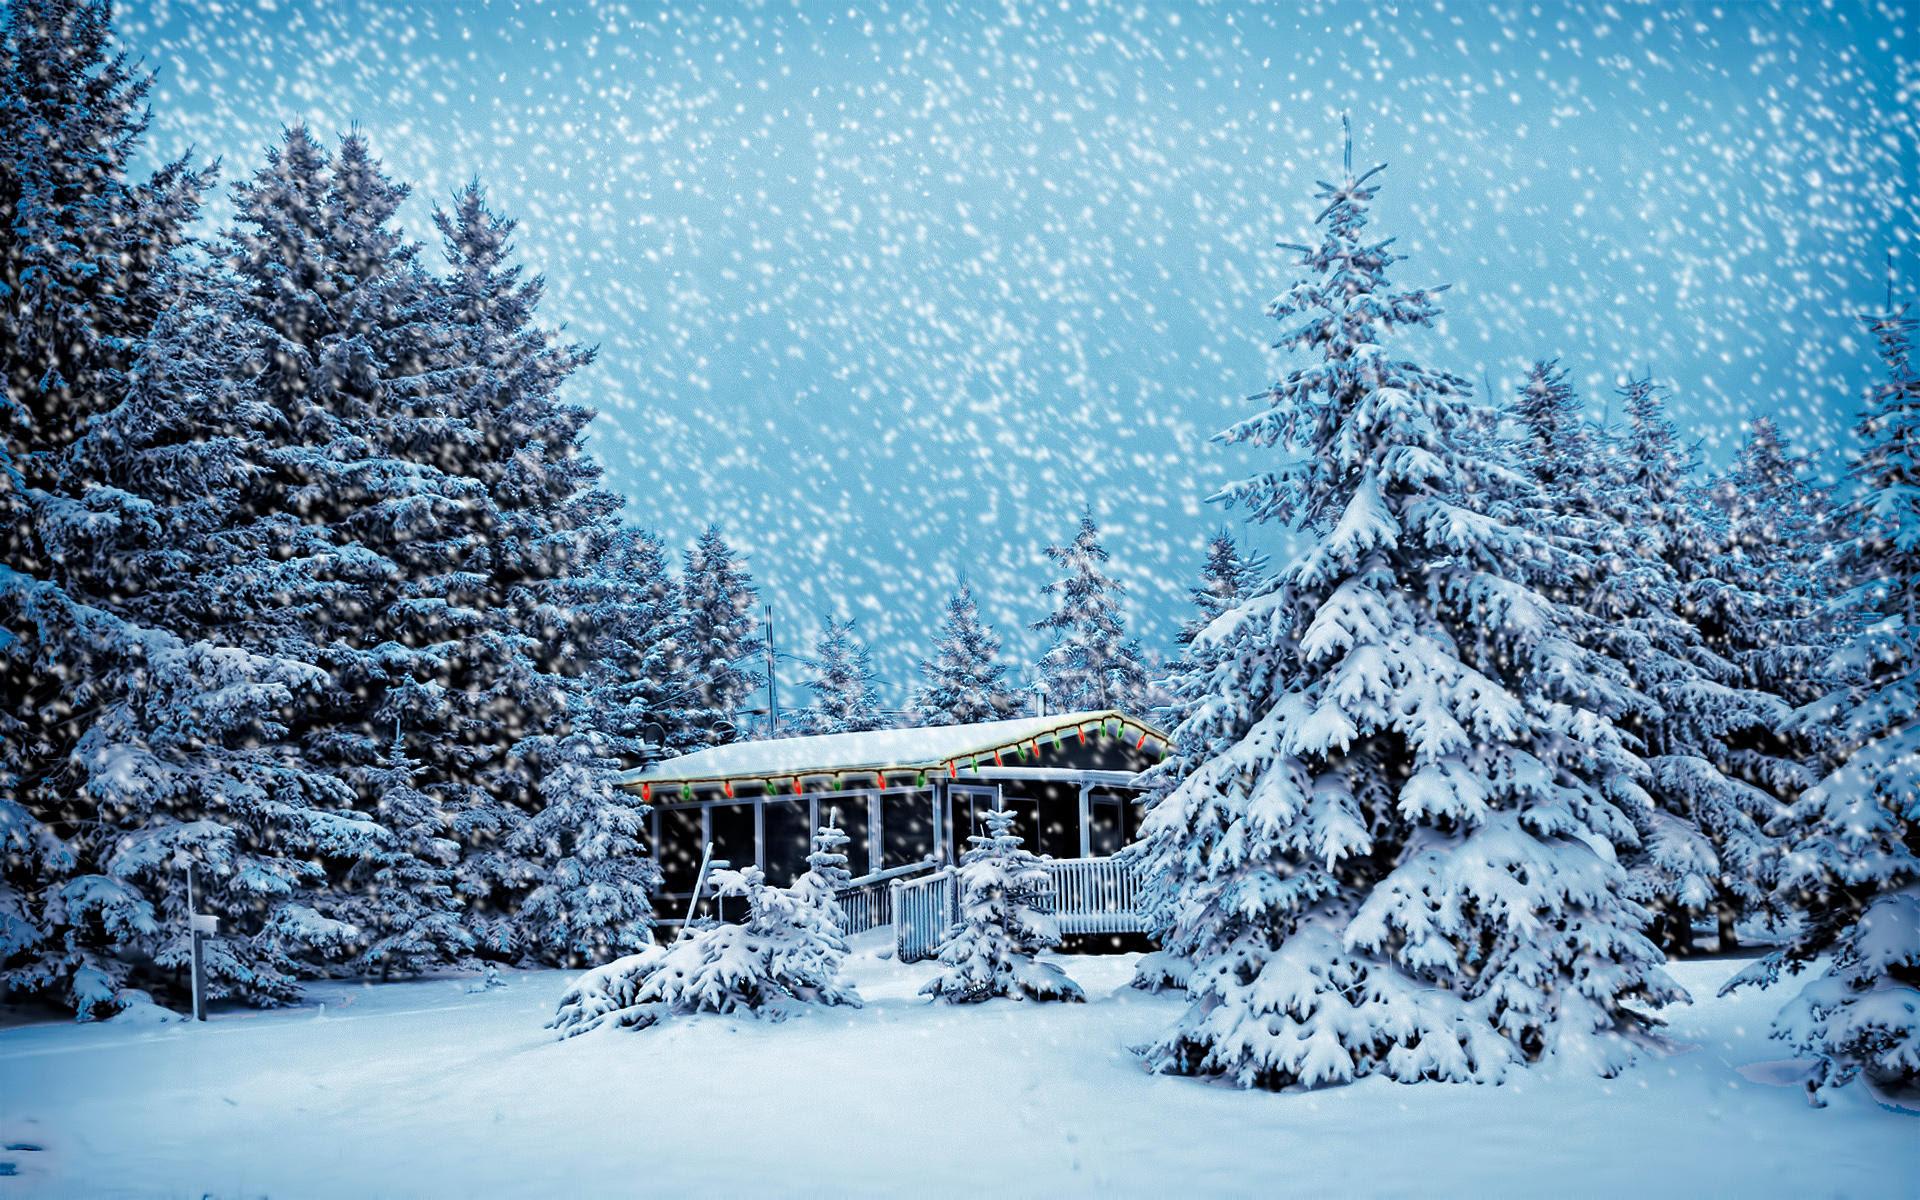 Christmas Snowstorm HD Wallpaper | Theme Bin - Customization, HD ...